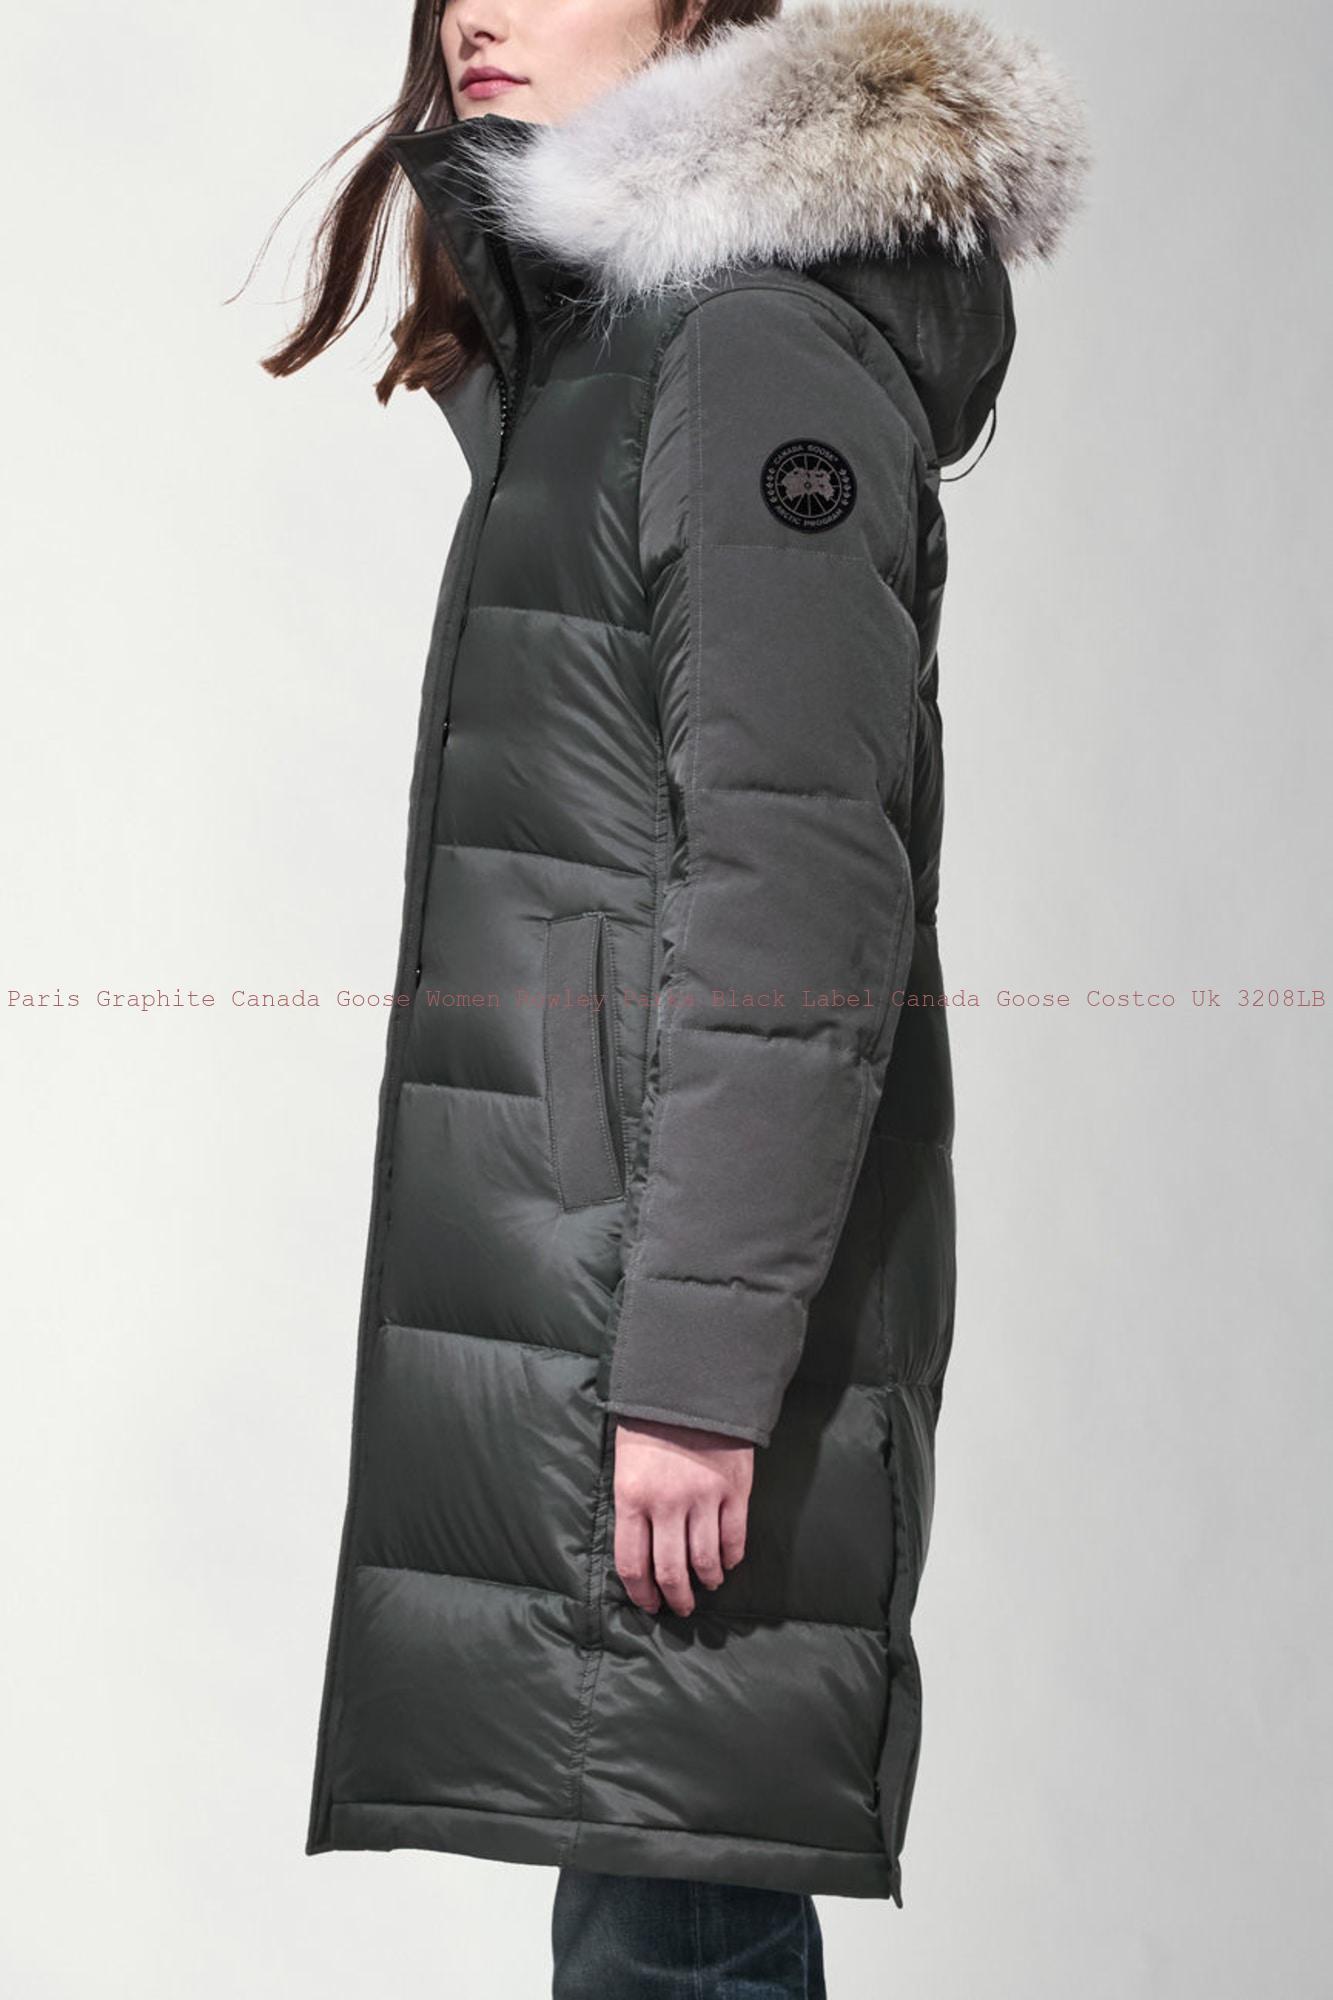 Paris Graphite Canada Goose Women Rowley Parka Black Label Canada Goose  Costco Uk 3208LB bd7f3c0a4